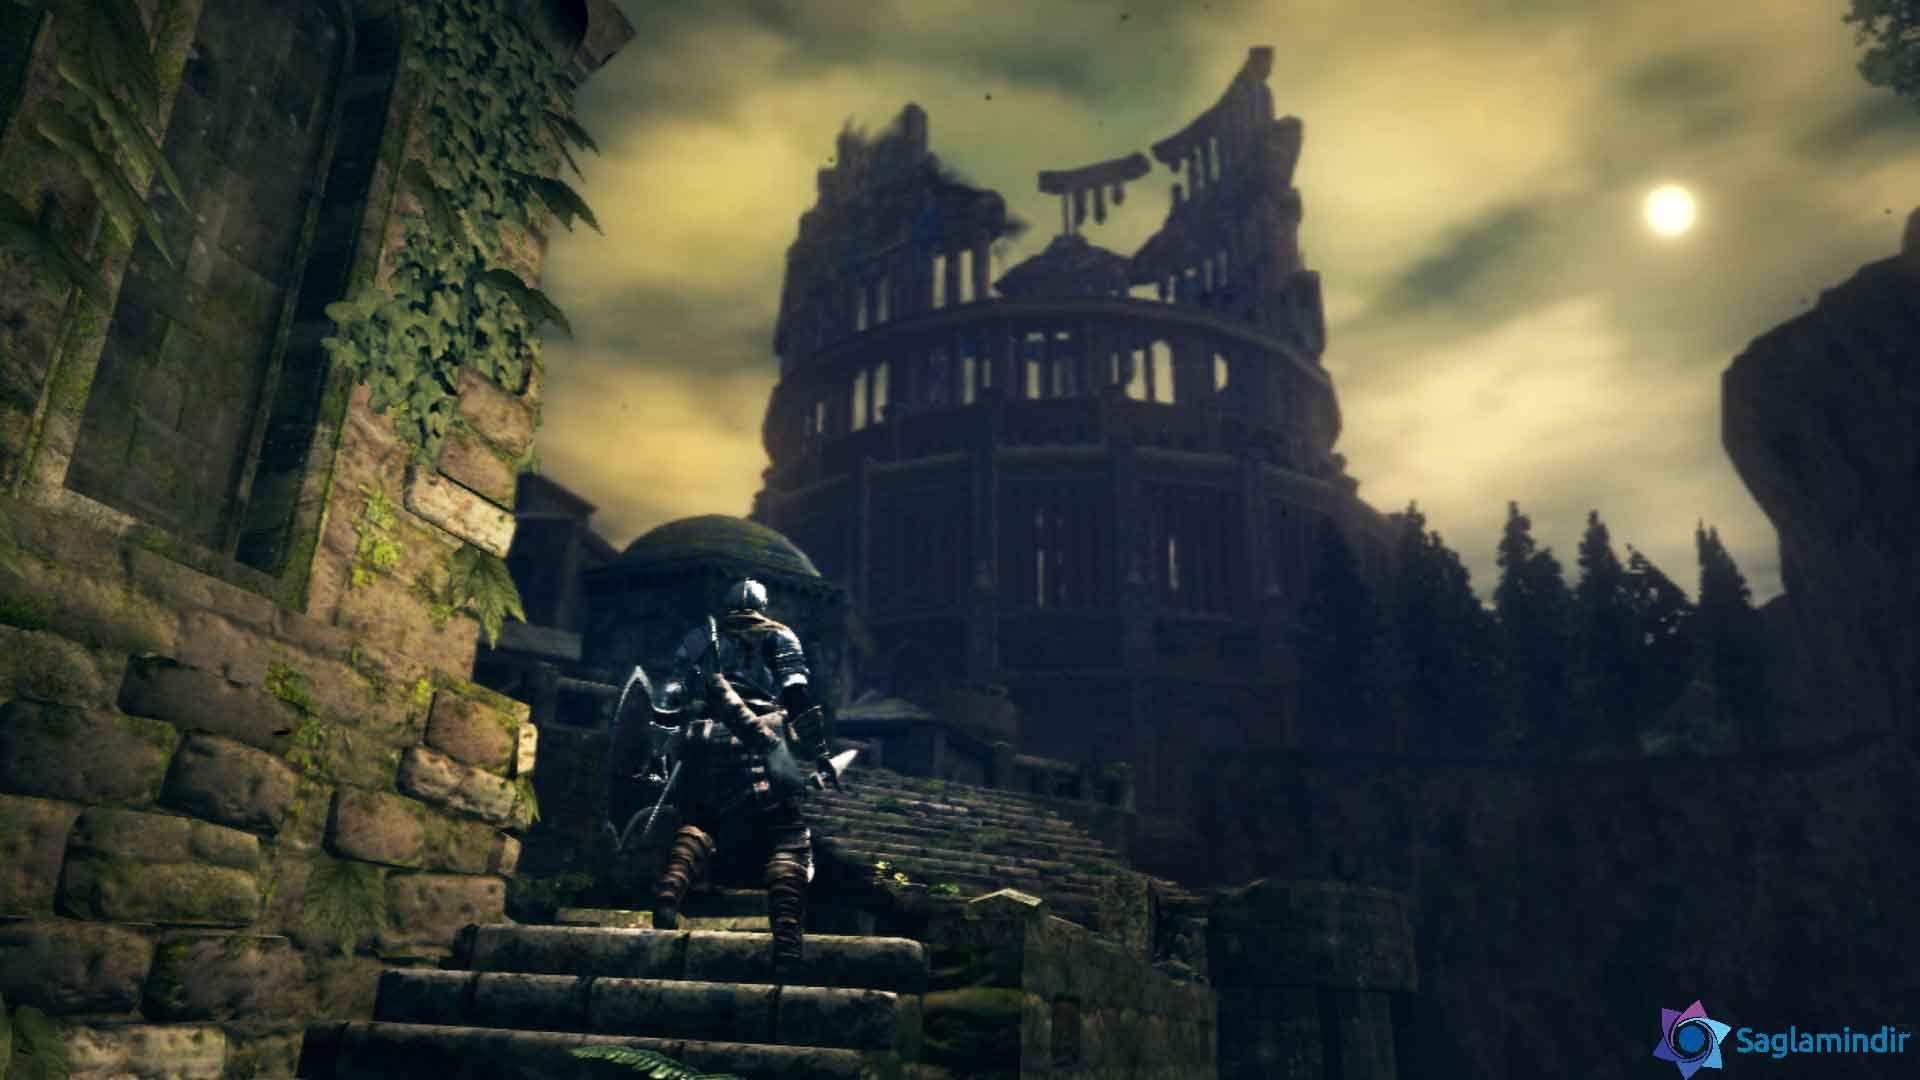 Dark-Souls-1-Prepare-To-Die-Edition-saglamindir